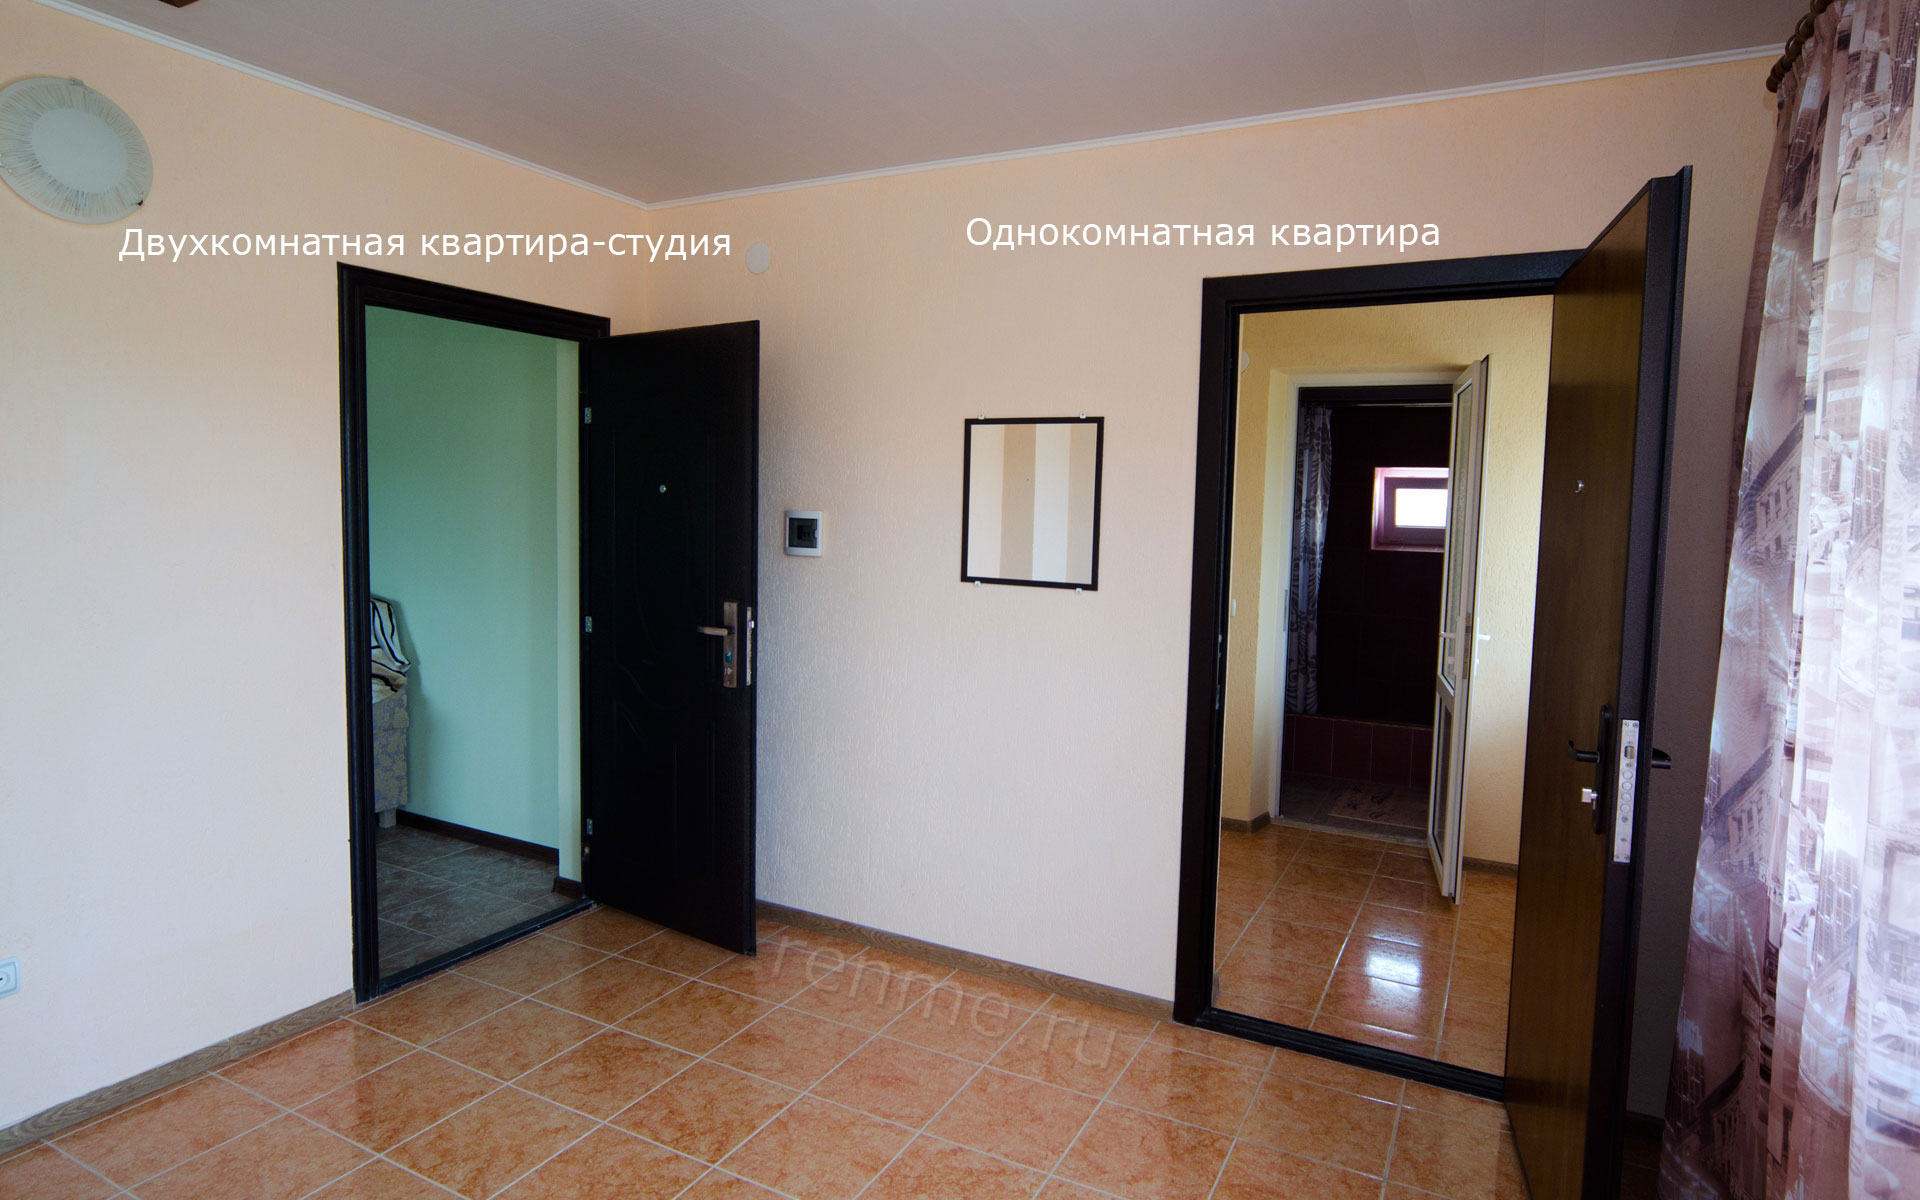 Холл. Двухкомнатная квартира-студия. Апарт-отель на ул. Гайдара. Заозёрное